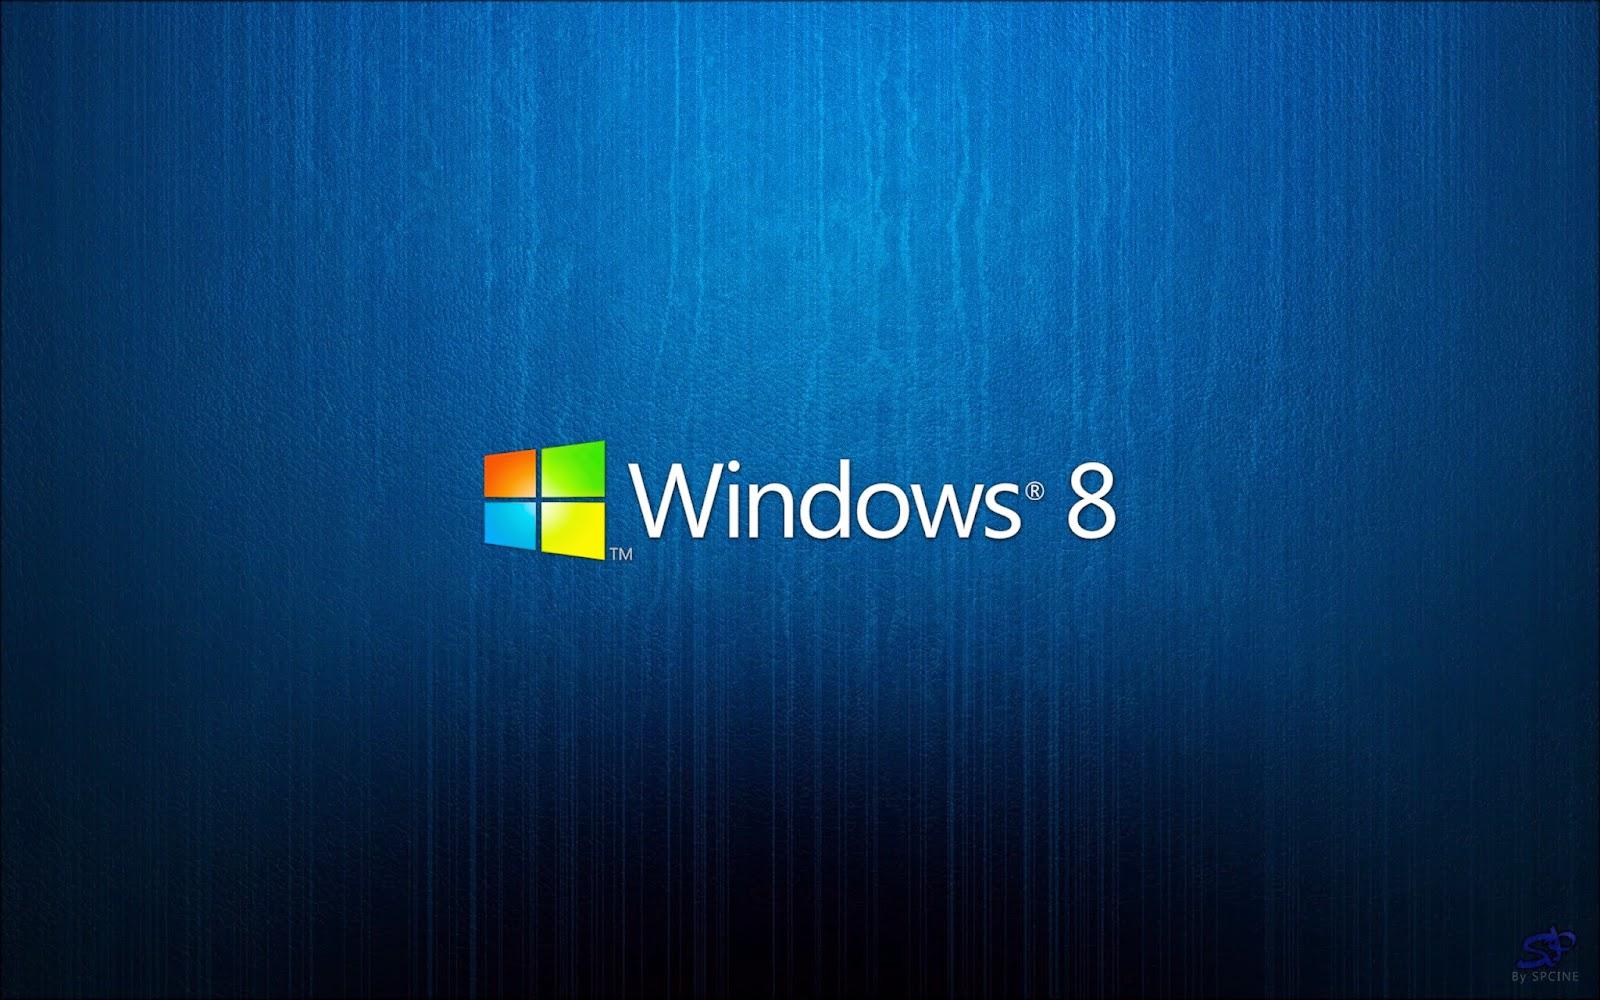 Cara Menjalankan Windows 8 Dengan Menggunakan Flashdisk